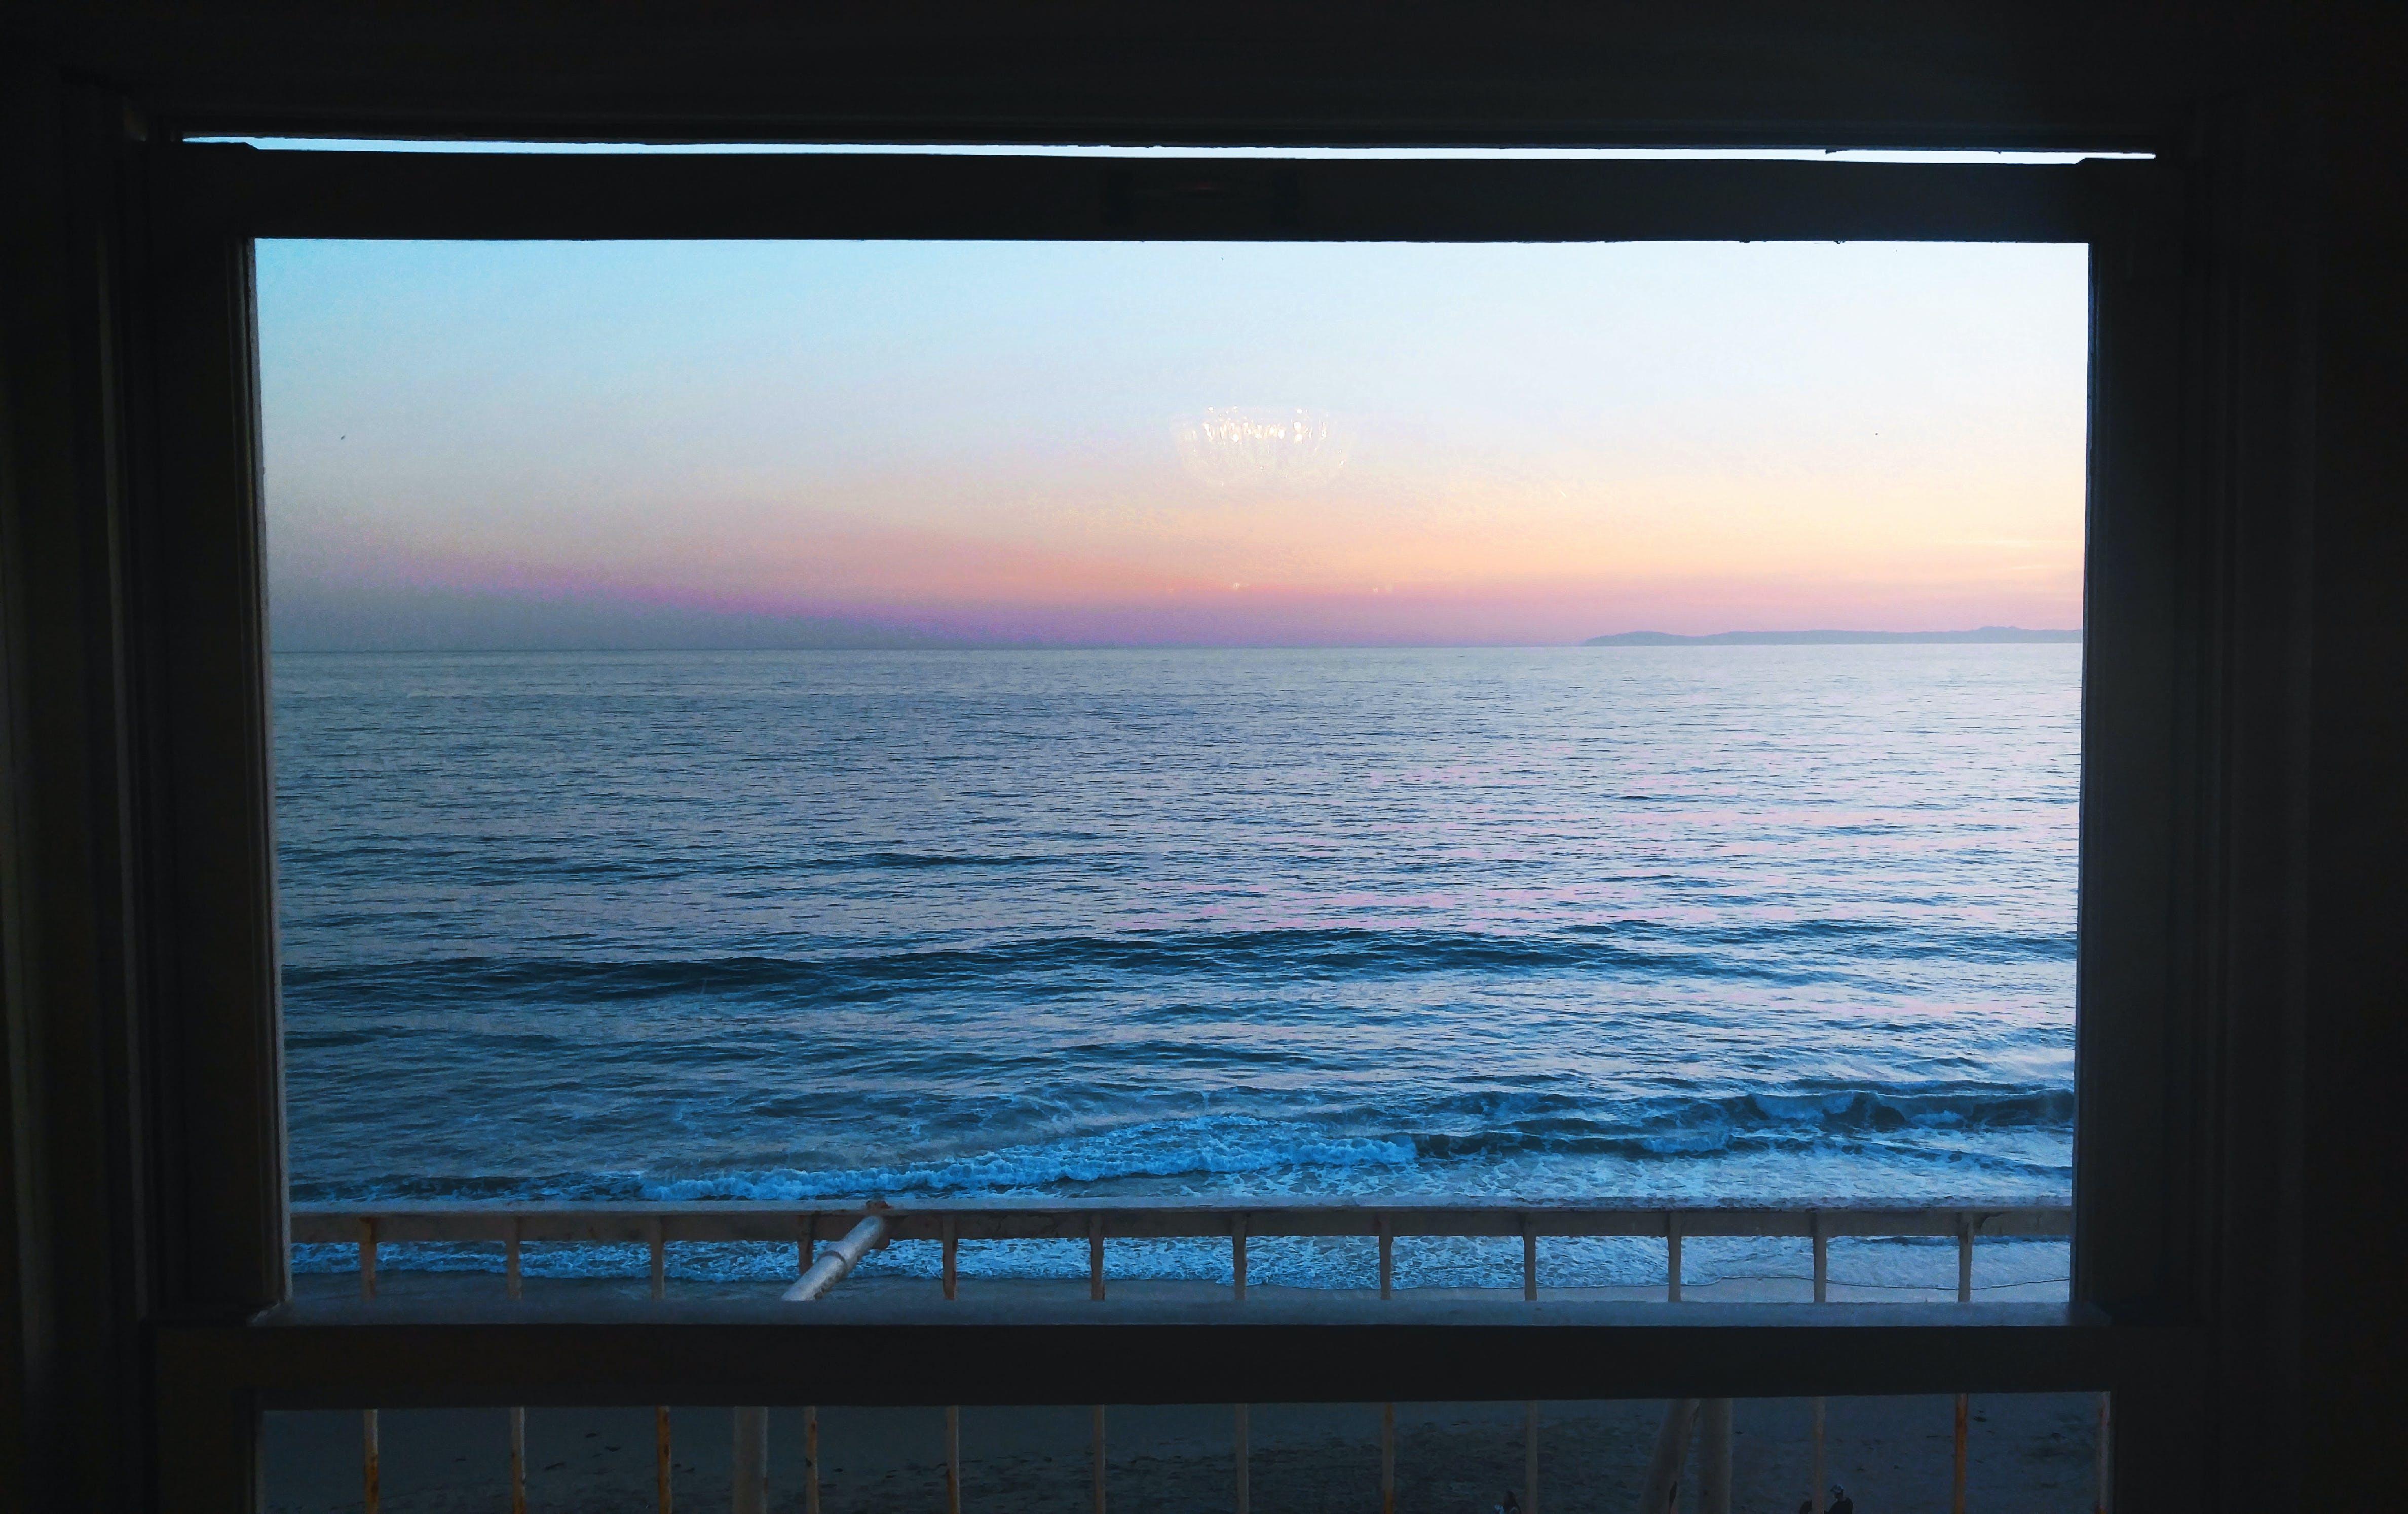 Free stock photo of beach, body of water, glass window, ocean